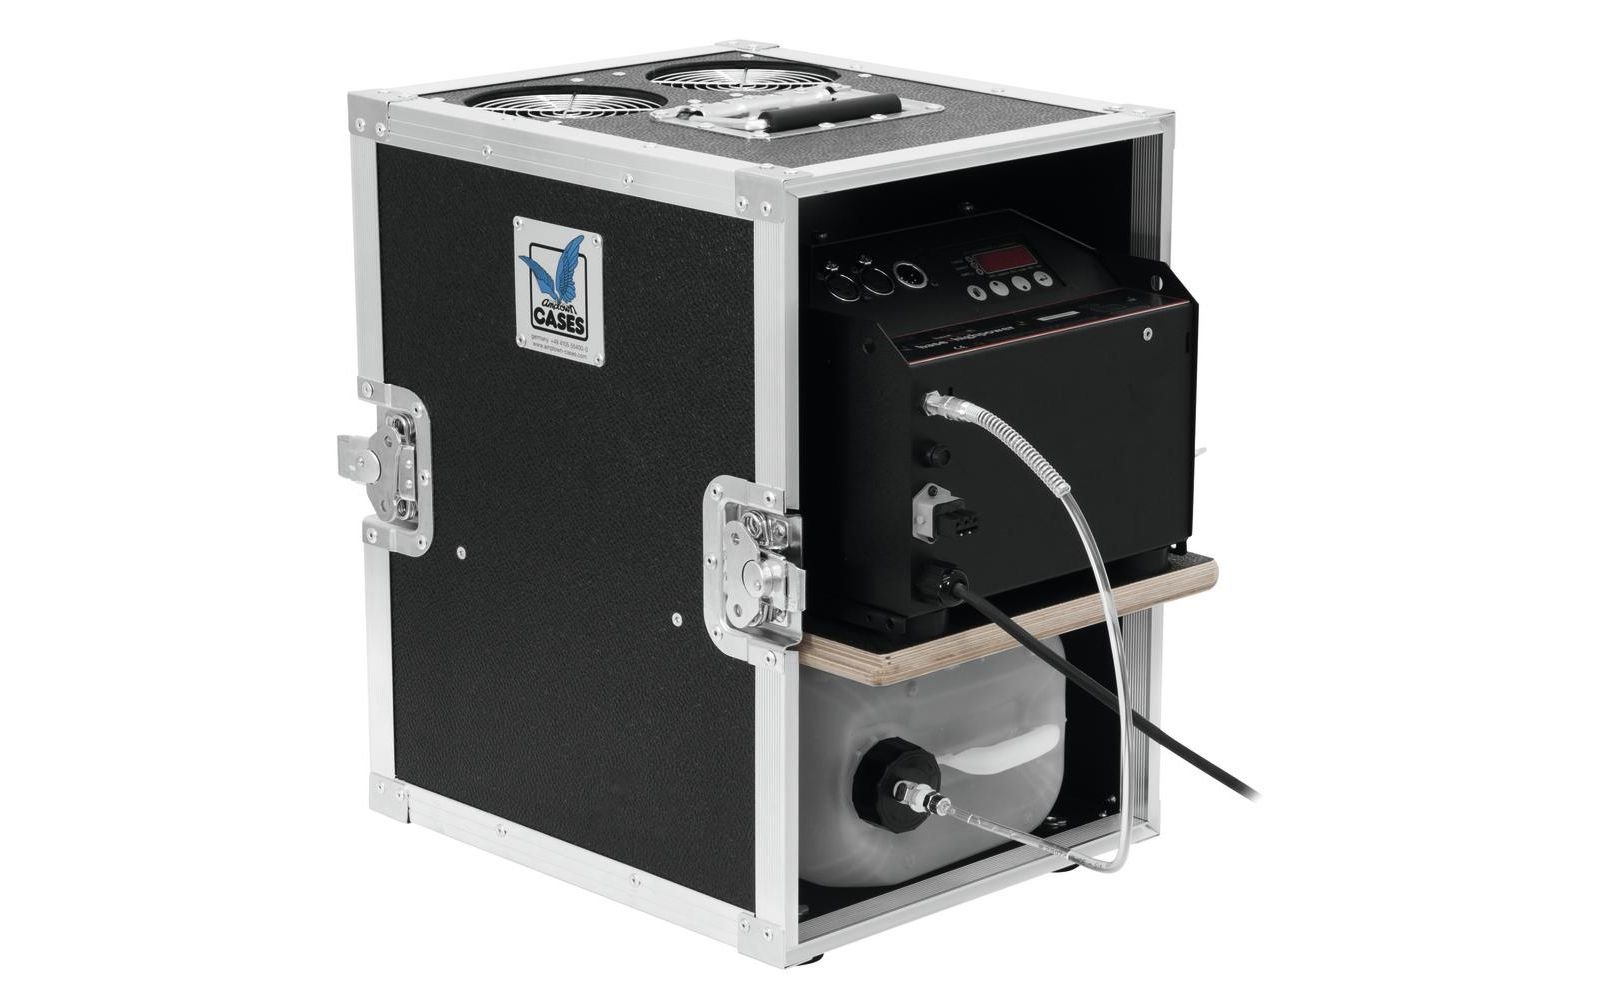 hazebase-base-highpower-cased-nebelmaschine